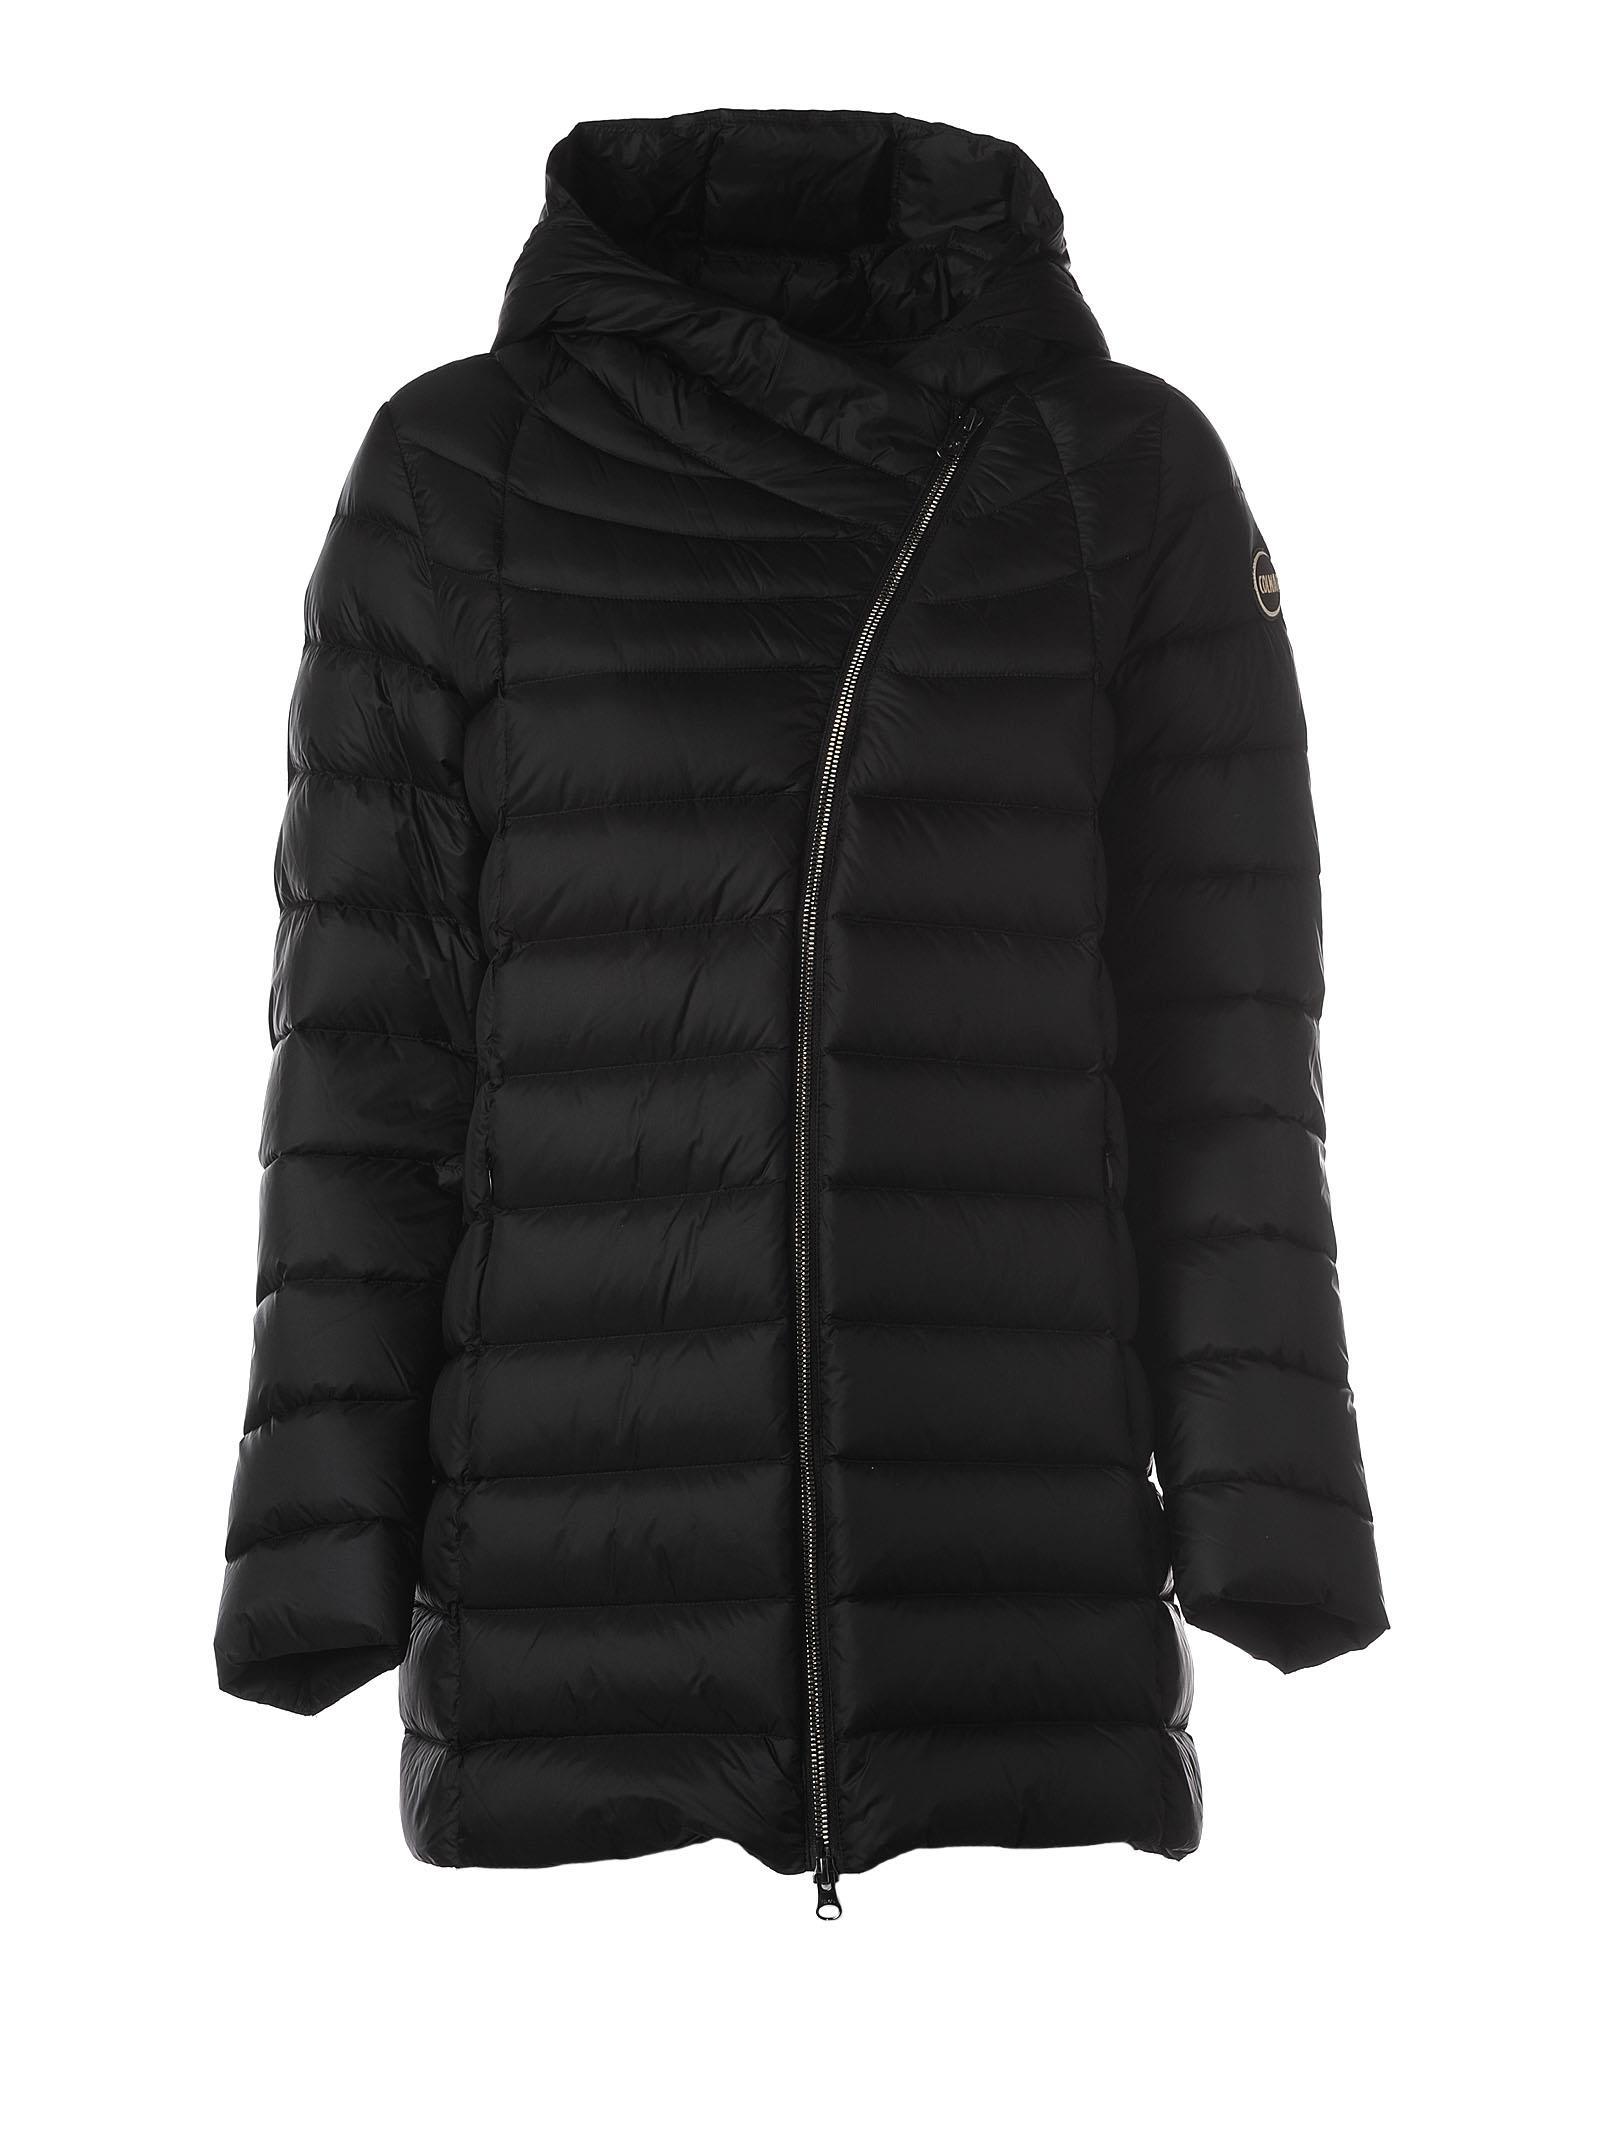 Colmar Black Hooded Padded Jacket